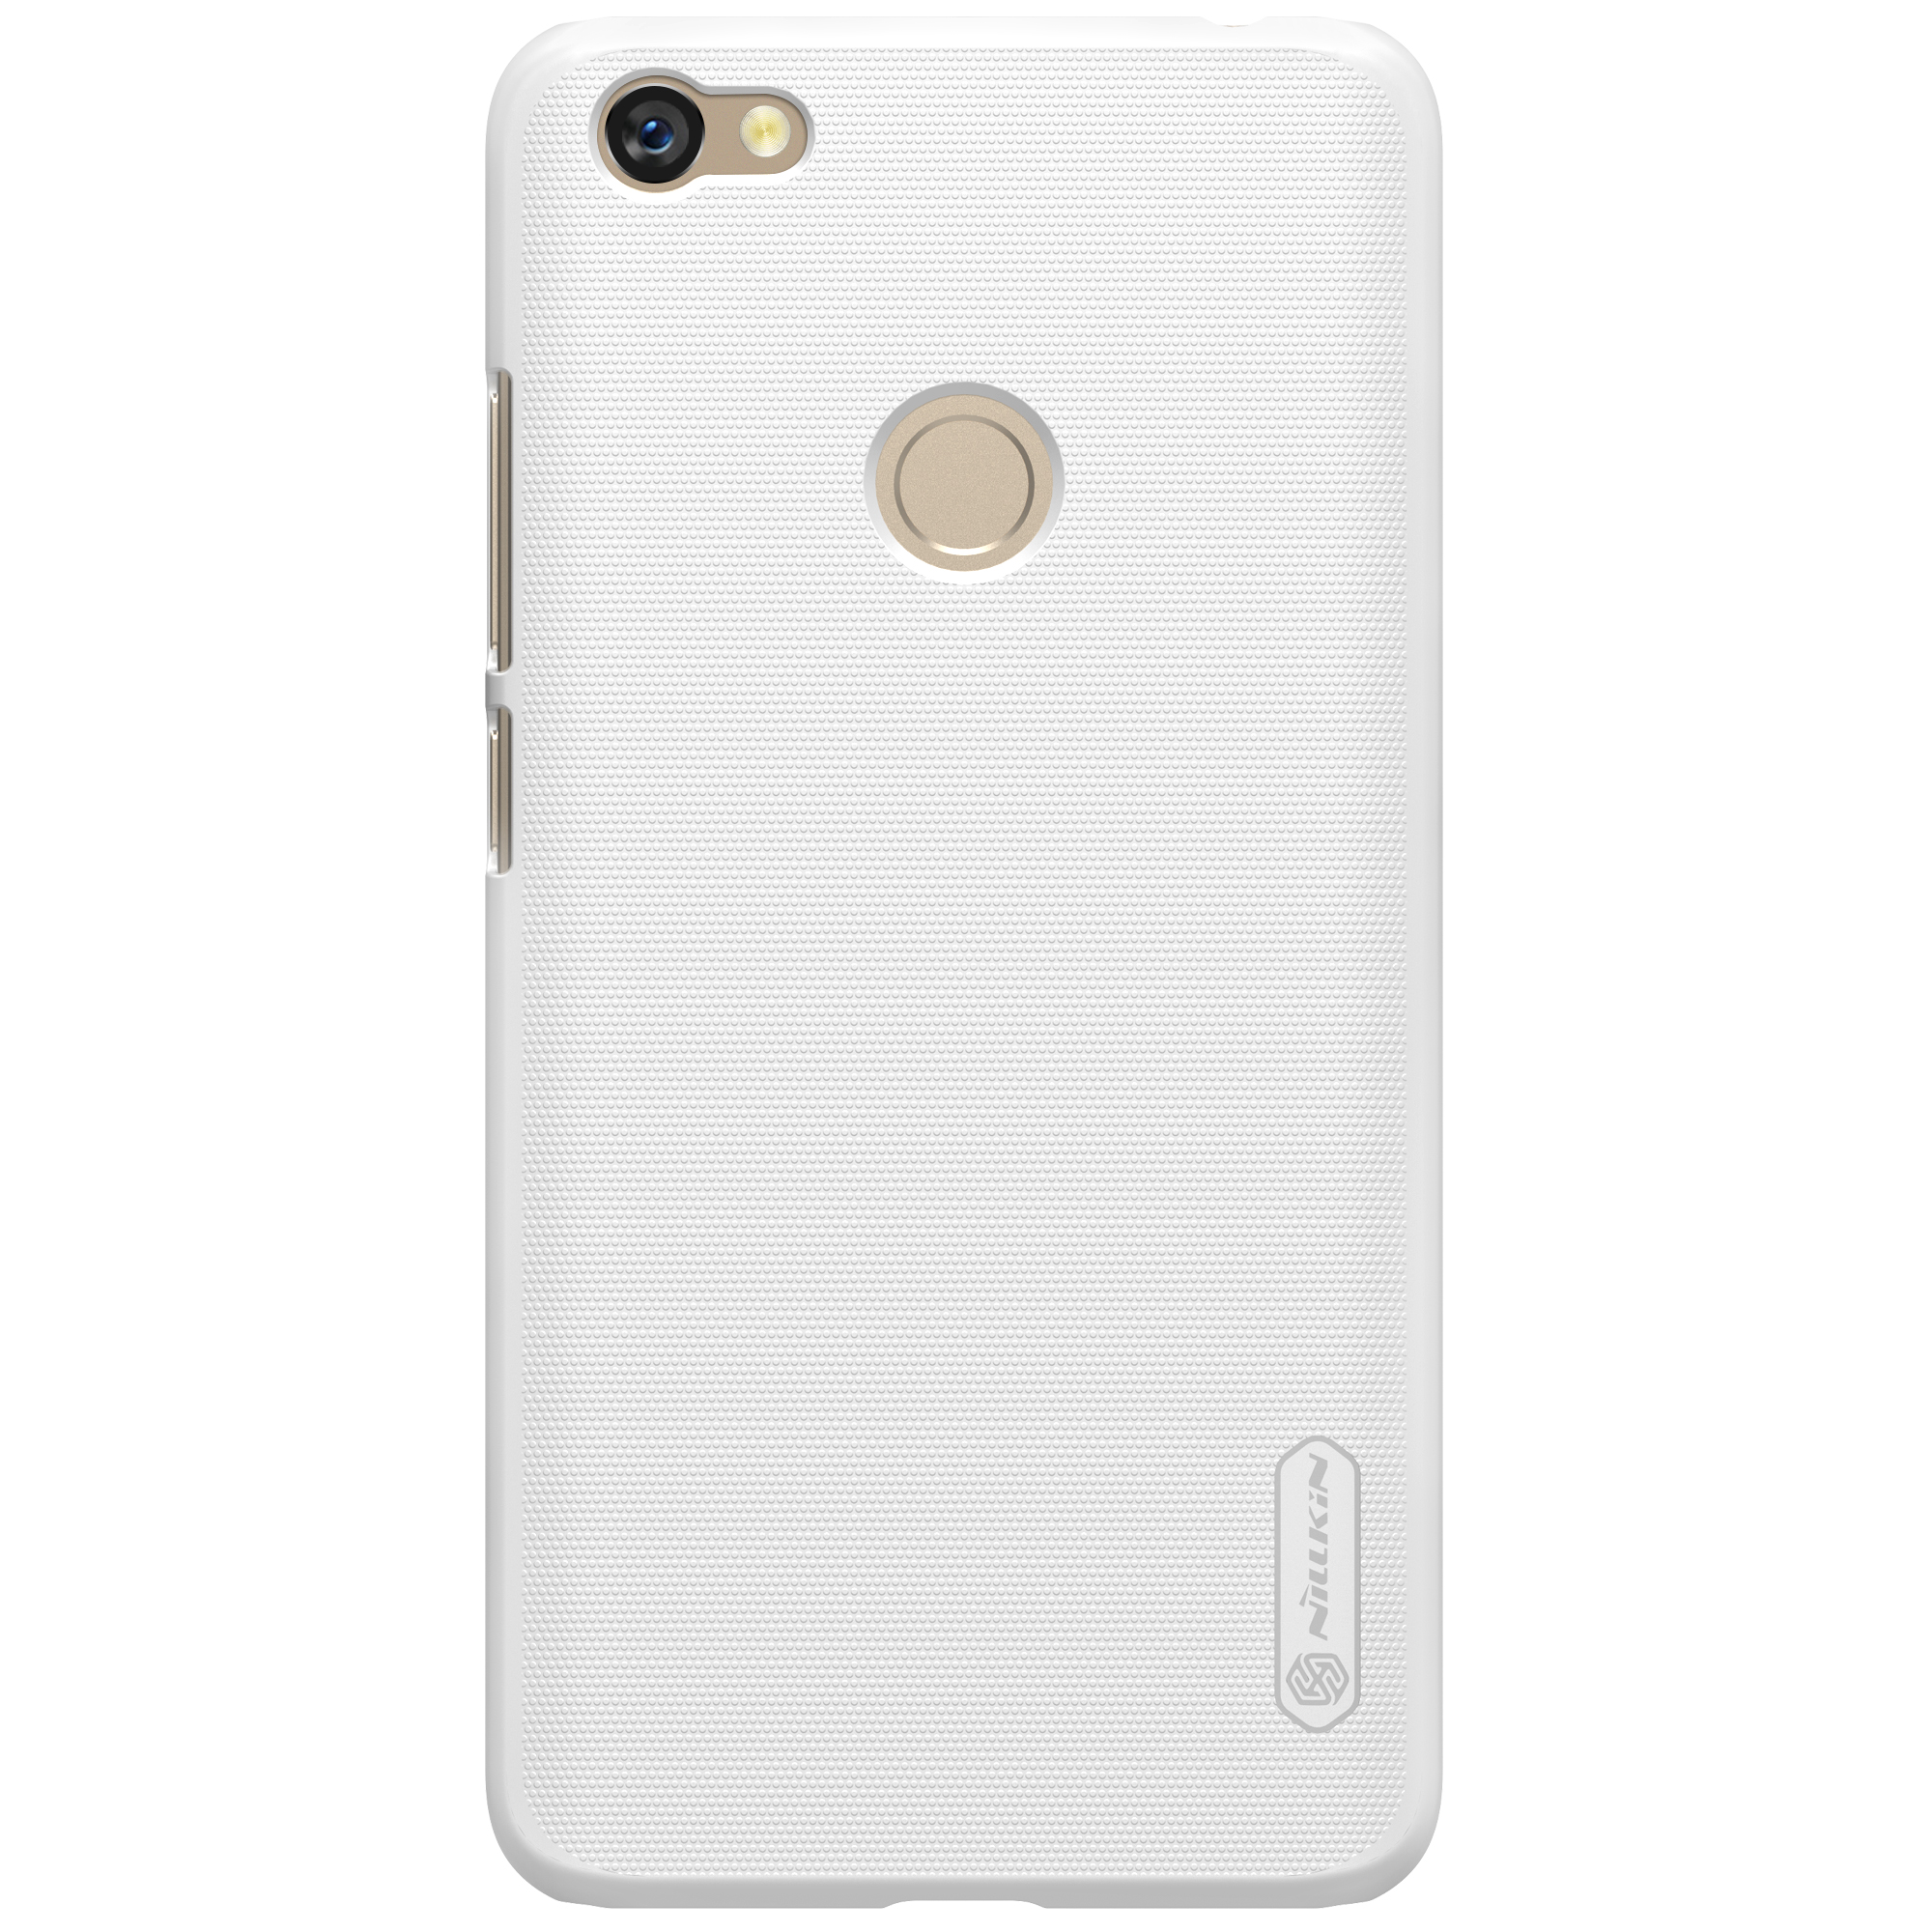 Чехол для Xiaomi Redmi Note 5, Xiaomi Redmi Note 5 Pro Накладка Frosted Xiaomi Redmi Note 5/Note 5 Pro White xiaomi redmi note 5